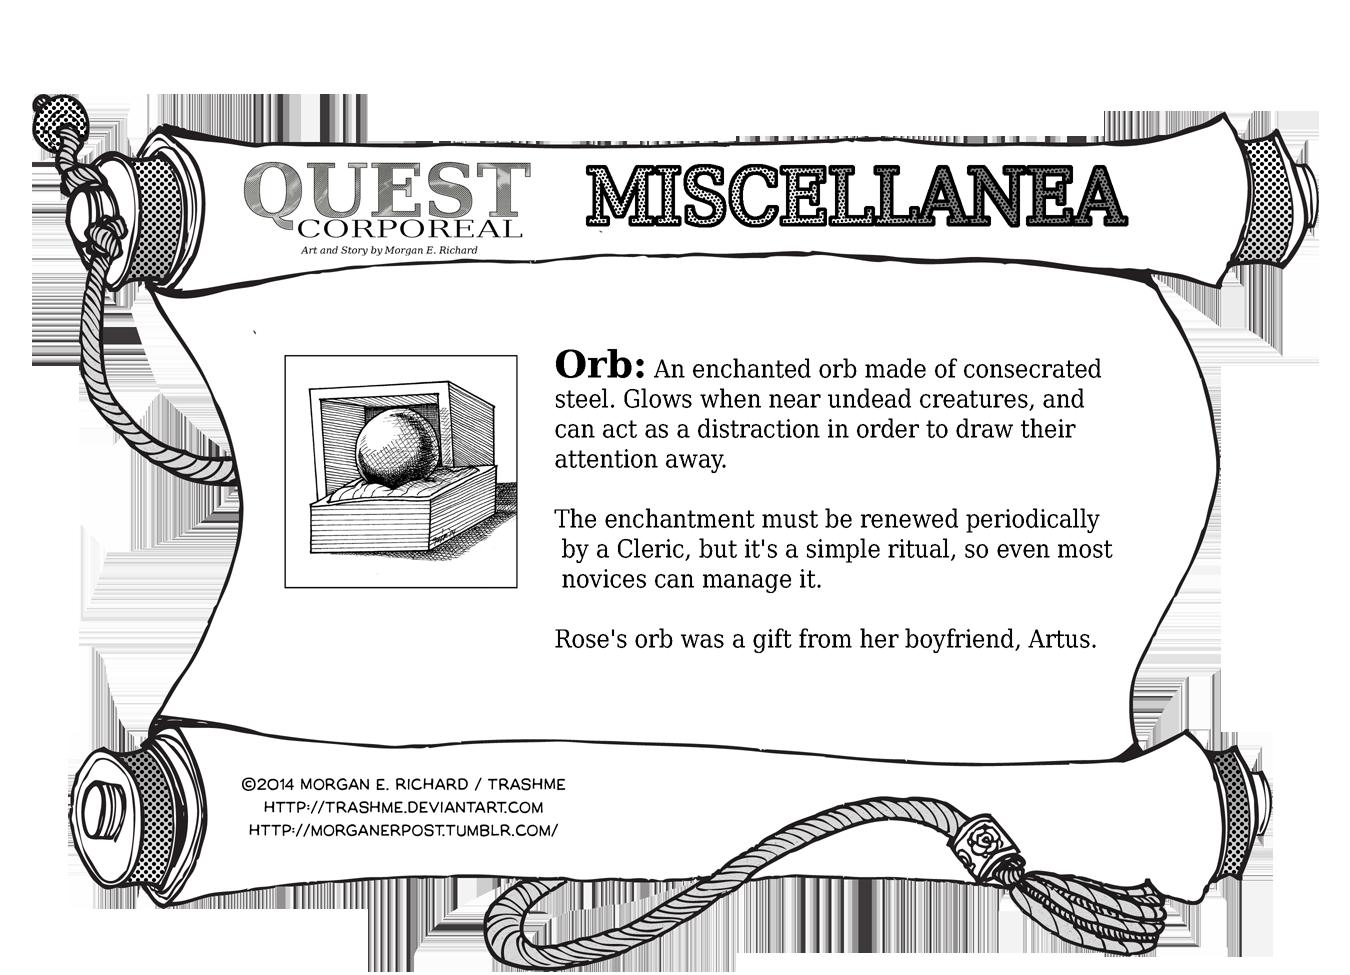 Miscellanea Corporeal: Orb